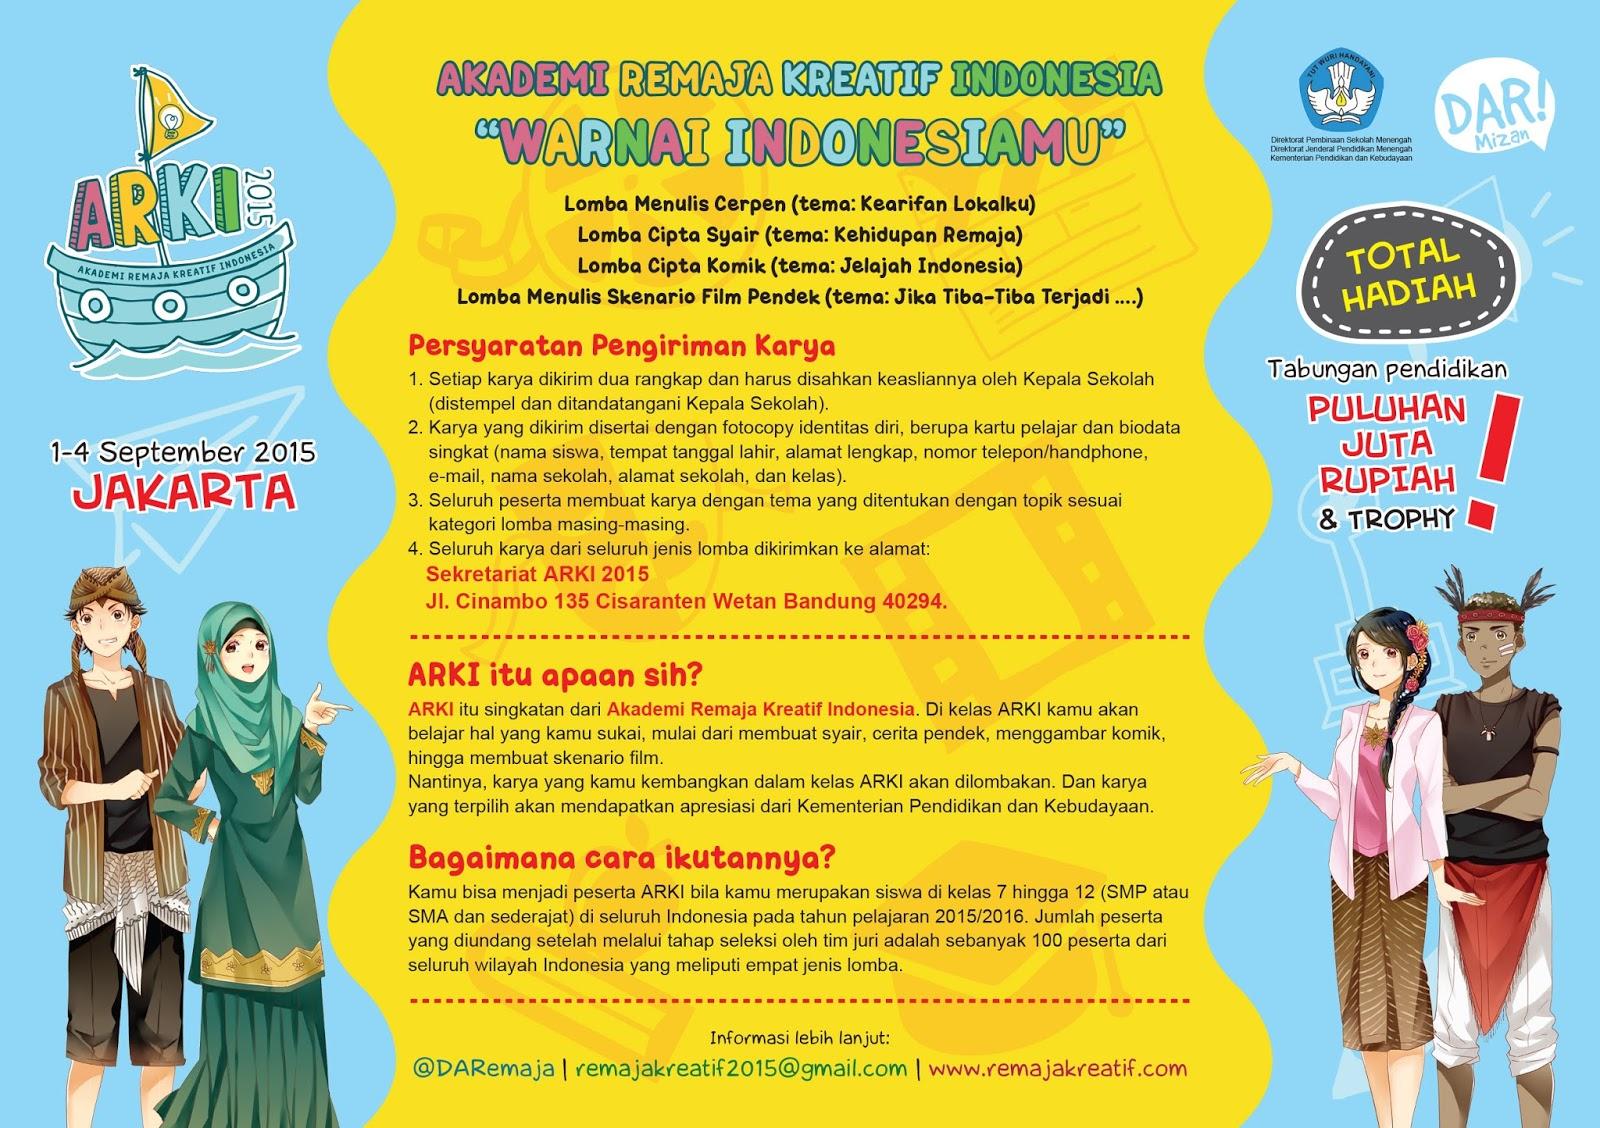 Akademi Remaja Kreatif Indonesia 2015 ~ Cerita Dunia Shinta